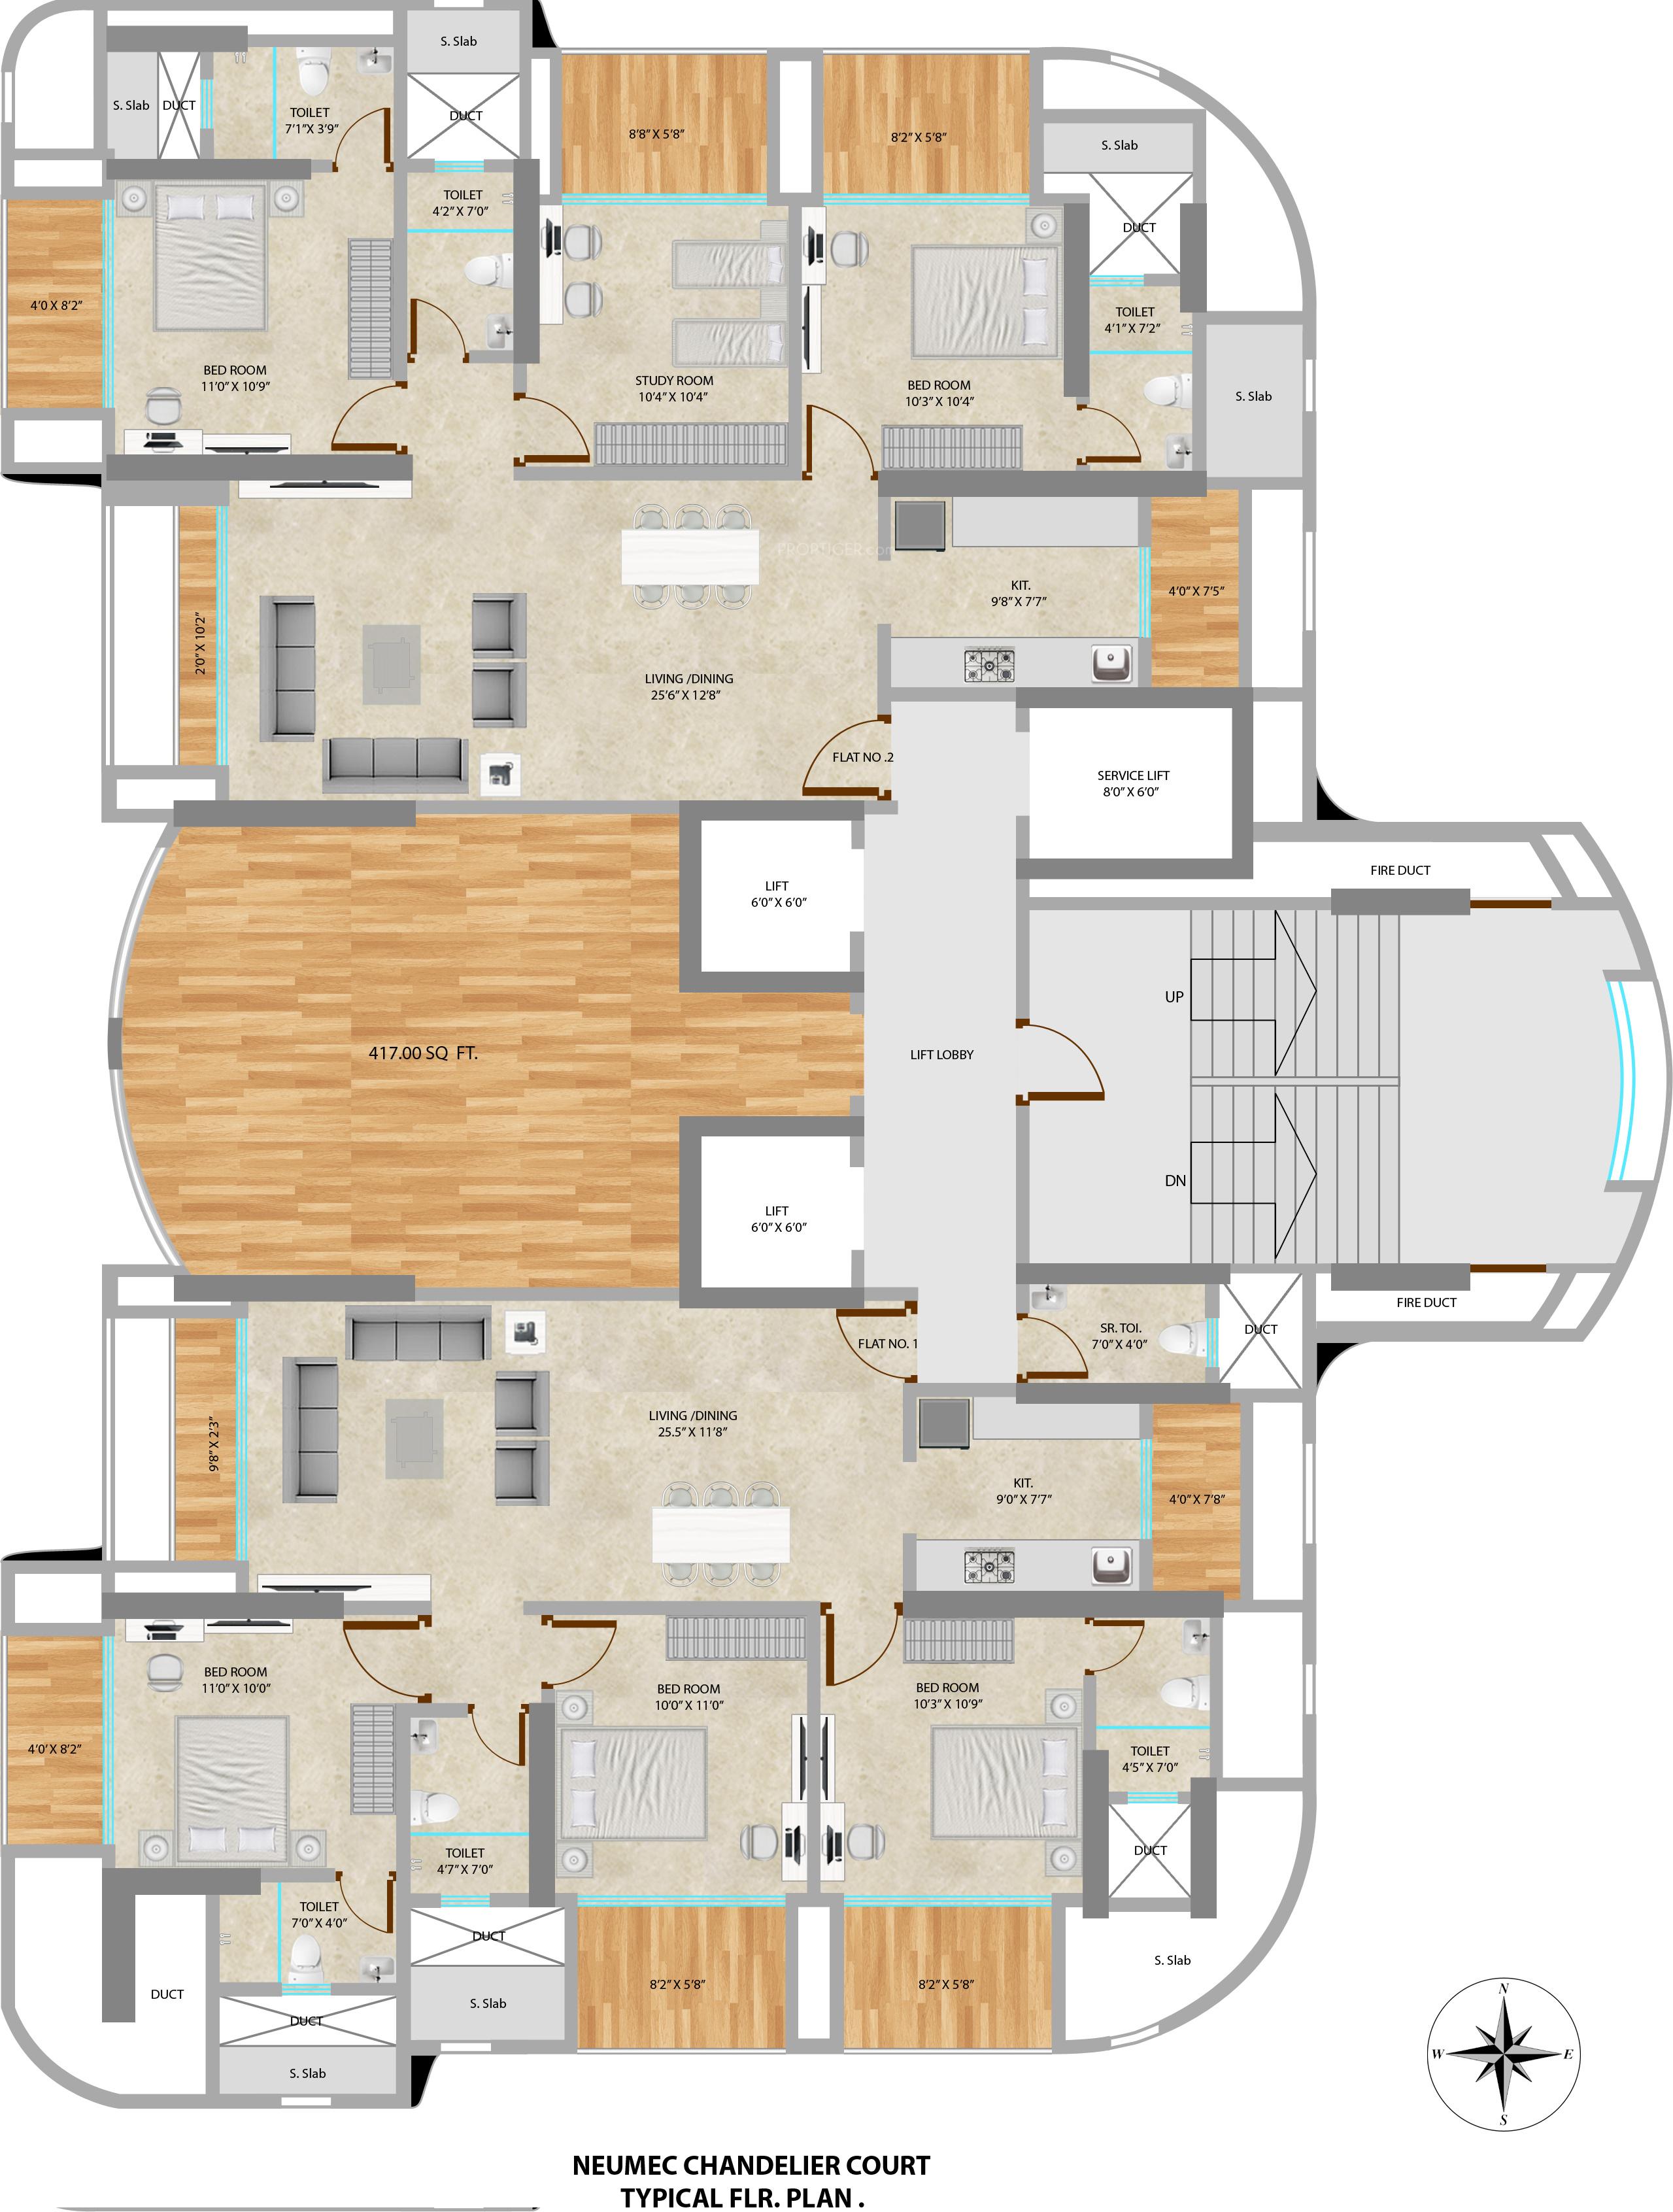 Neumec chandelier court in worli mumbai price location for 125 court street floor plans